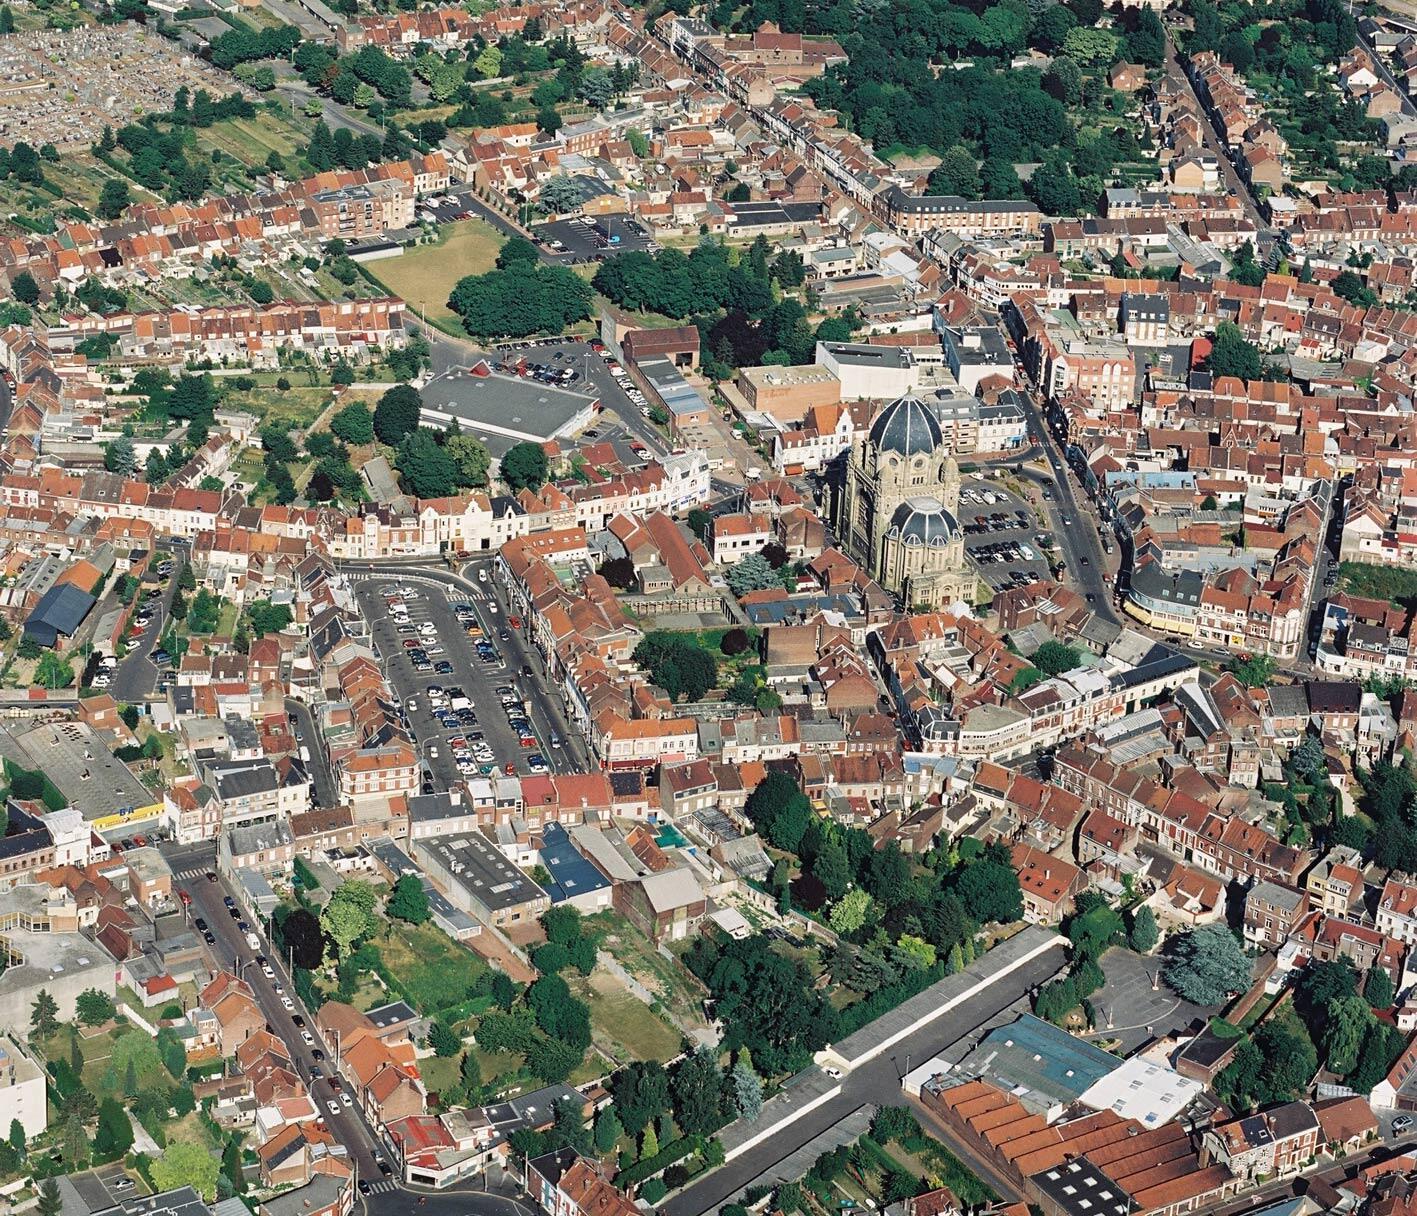 Vista aérea de la ciudad de Hénin-Beaumont.